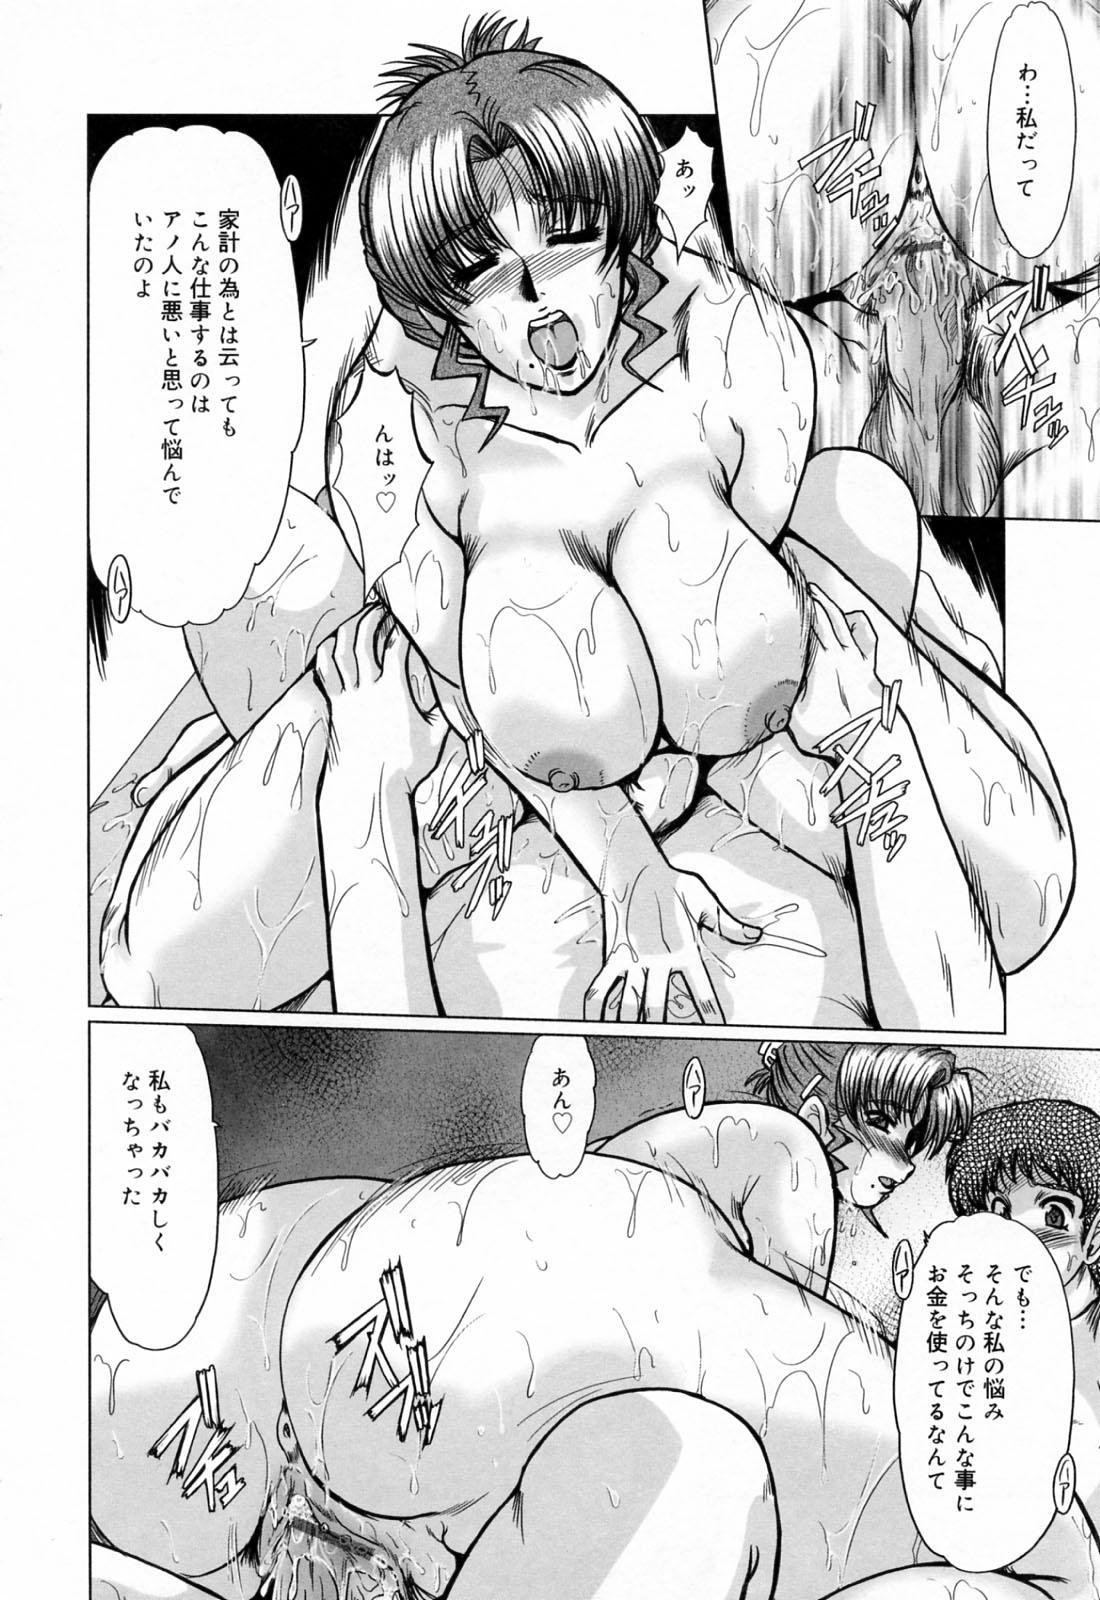 Kanjuku Hitozuma Nikki - The diary of the mature married woman 185